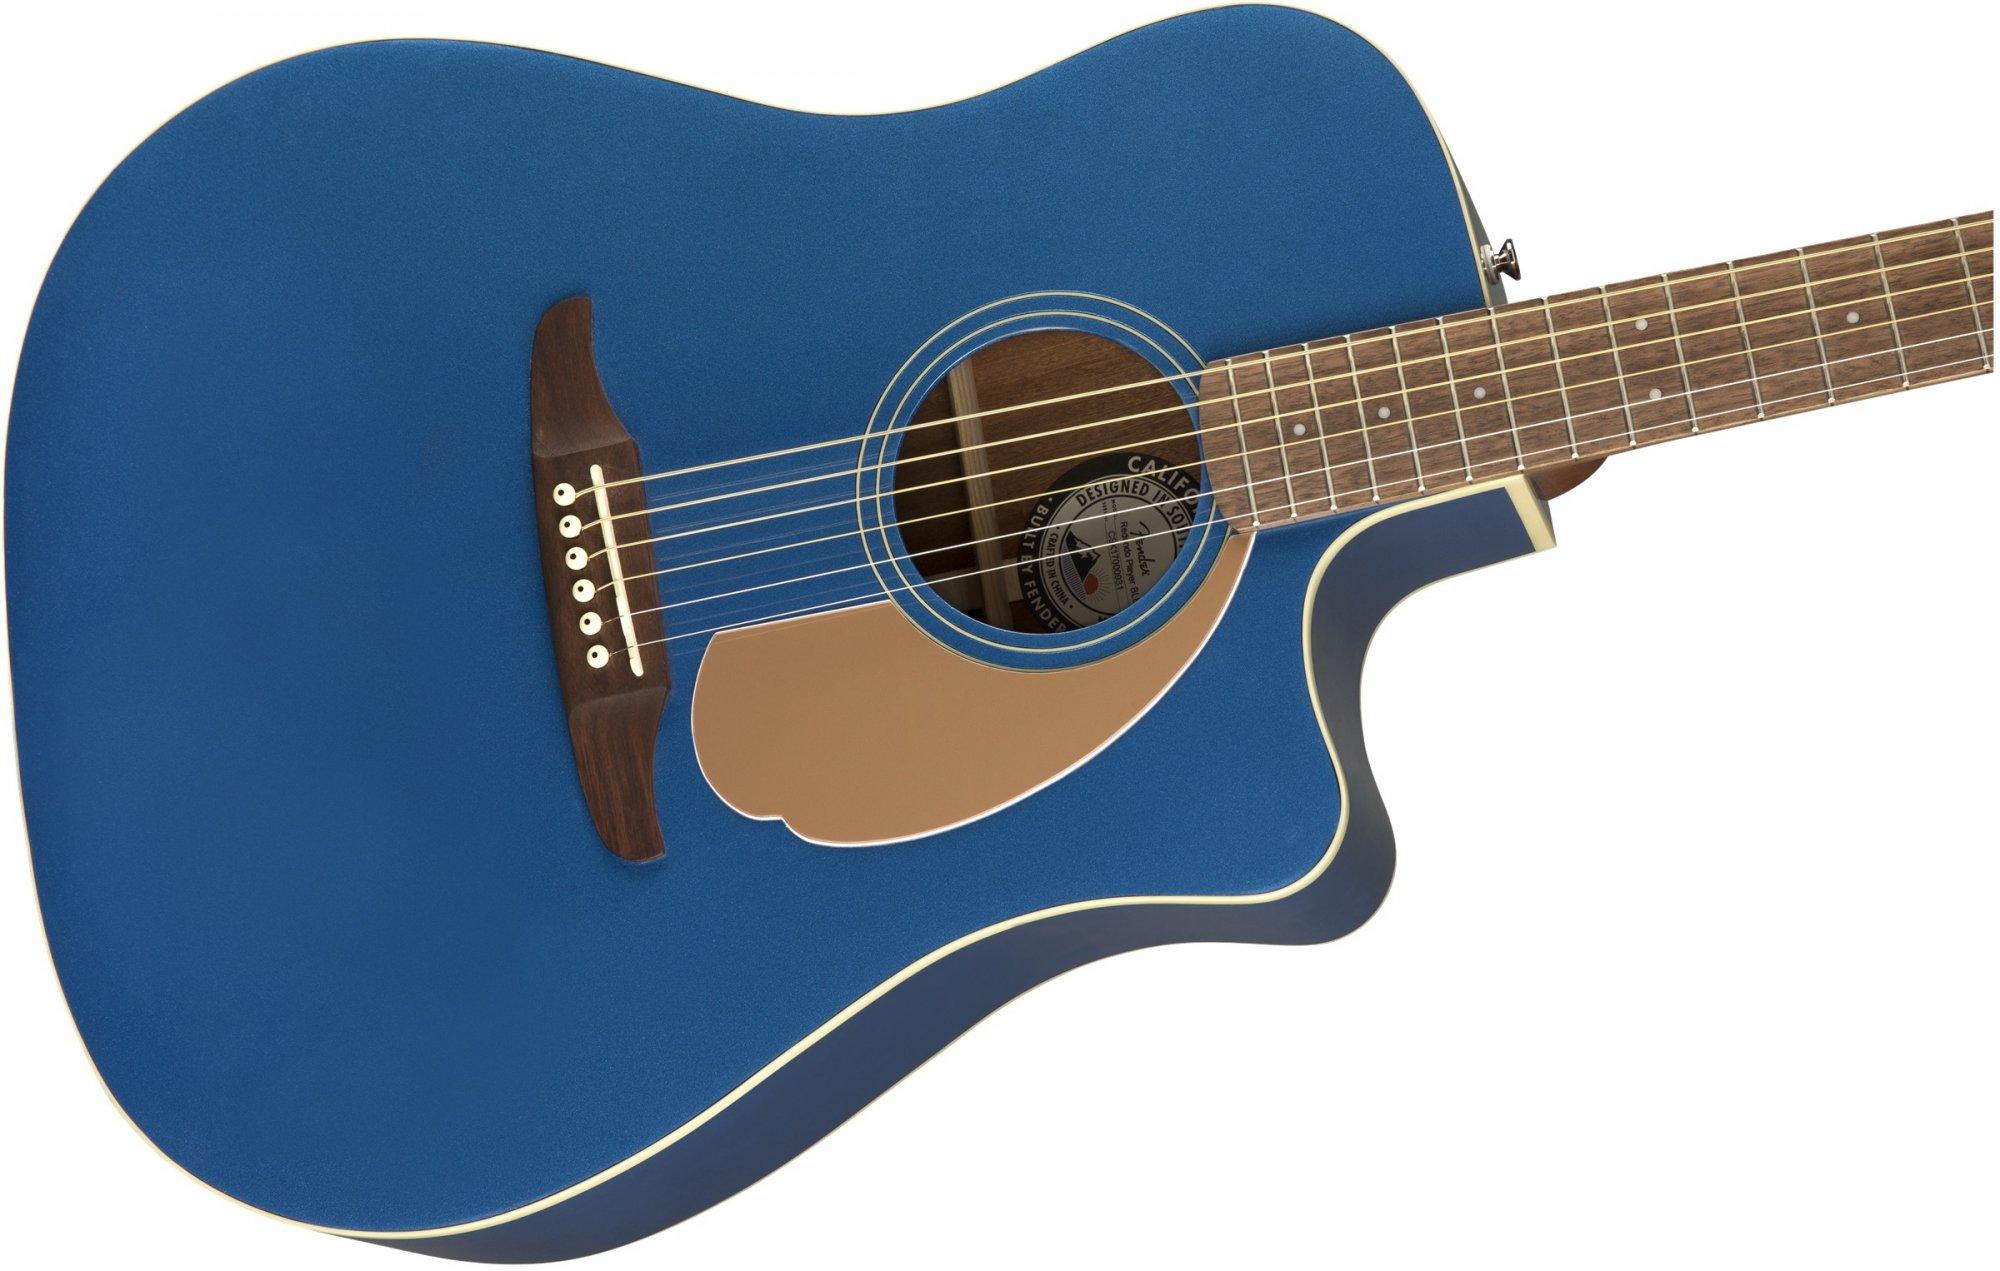 Fender Redondo Player, Belmont Blue